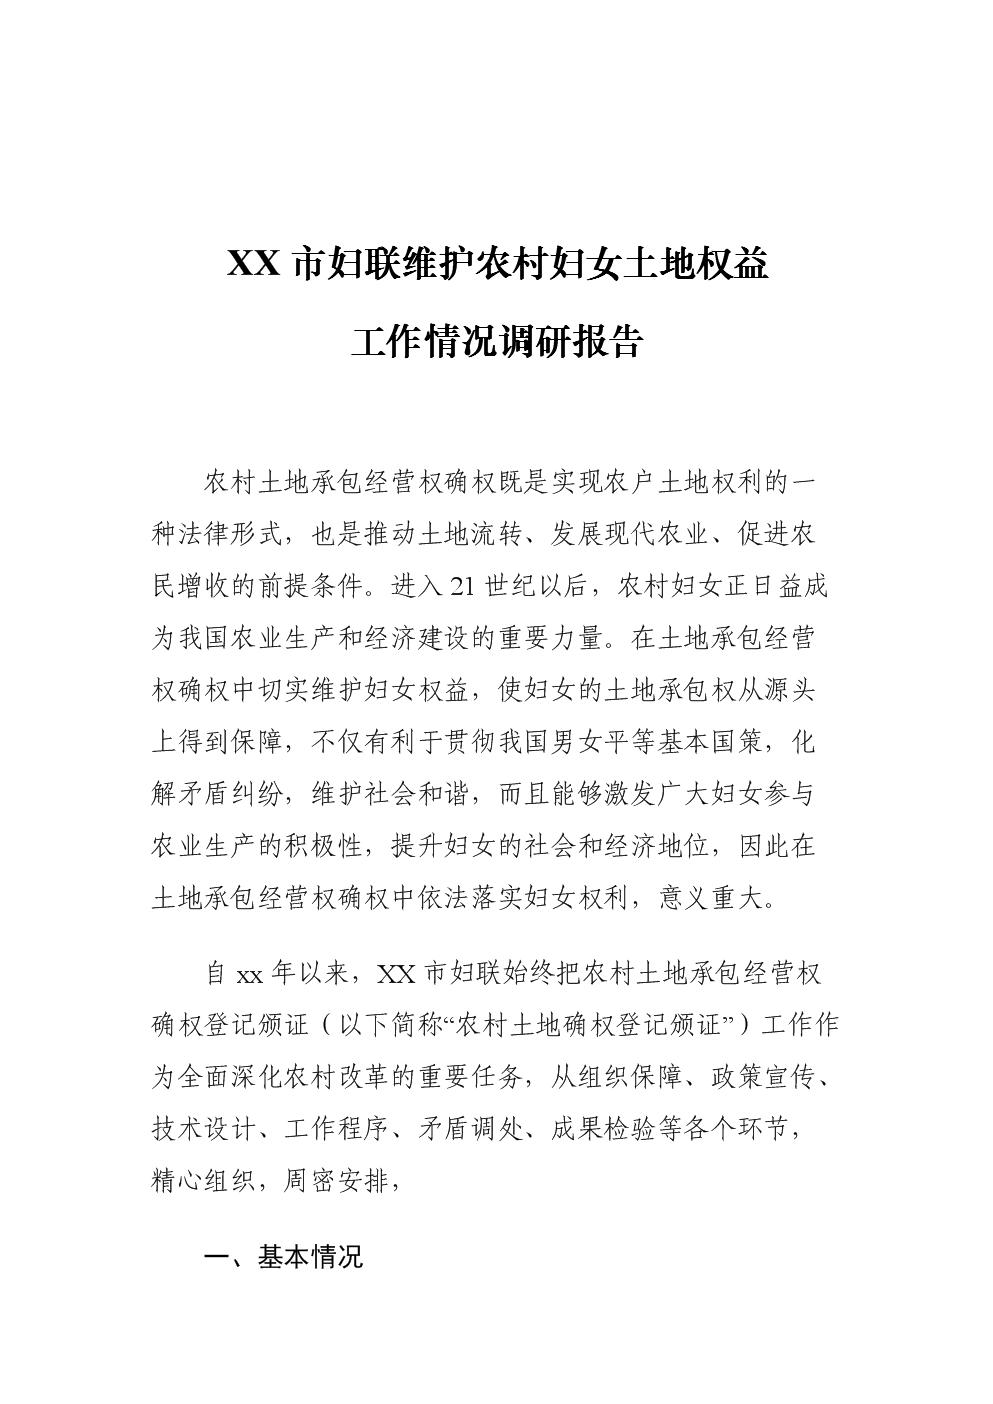 XX市妇联维护农村妇女土地权益工作情况调研报告.docx